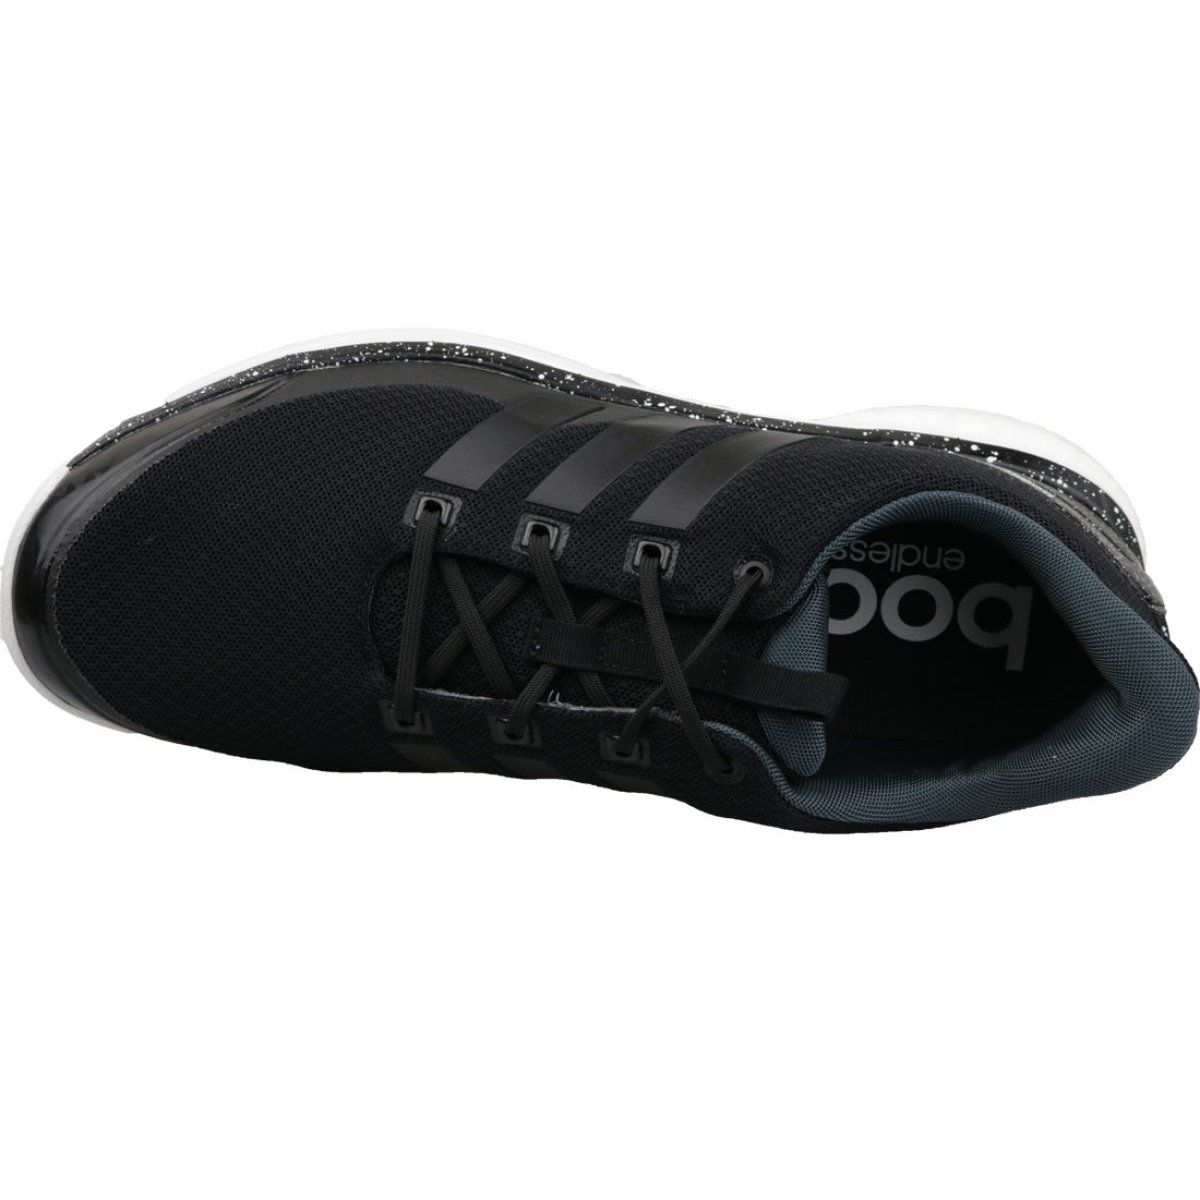 Buty Adidas Adipower Sport Boost 2 M F33216 Czarne Black Shoes Adidas Brand Sports Shoes Adidas